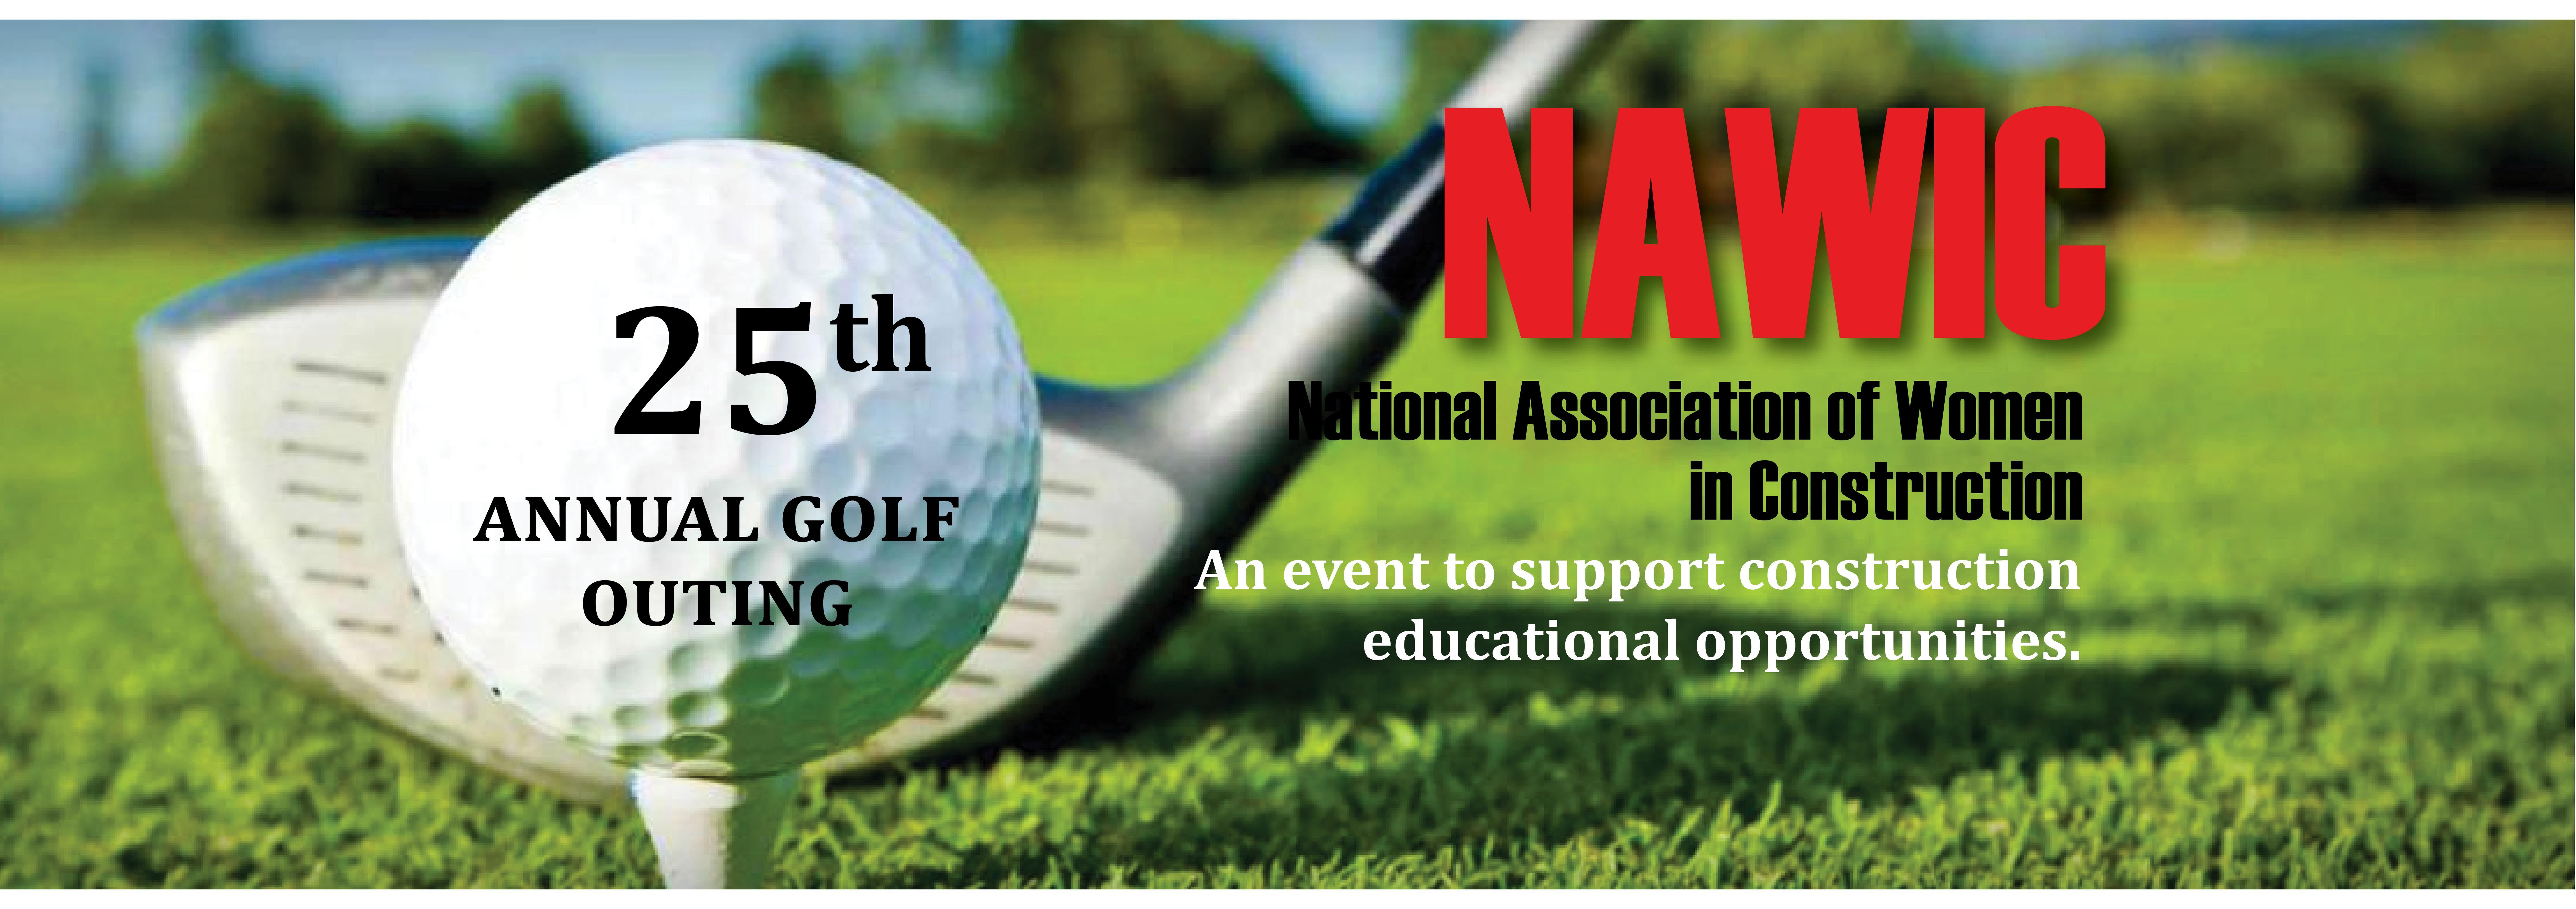 25th Annual NAWIC Golf Event 2019